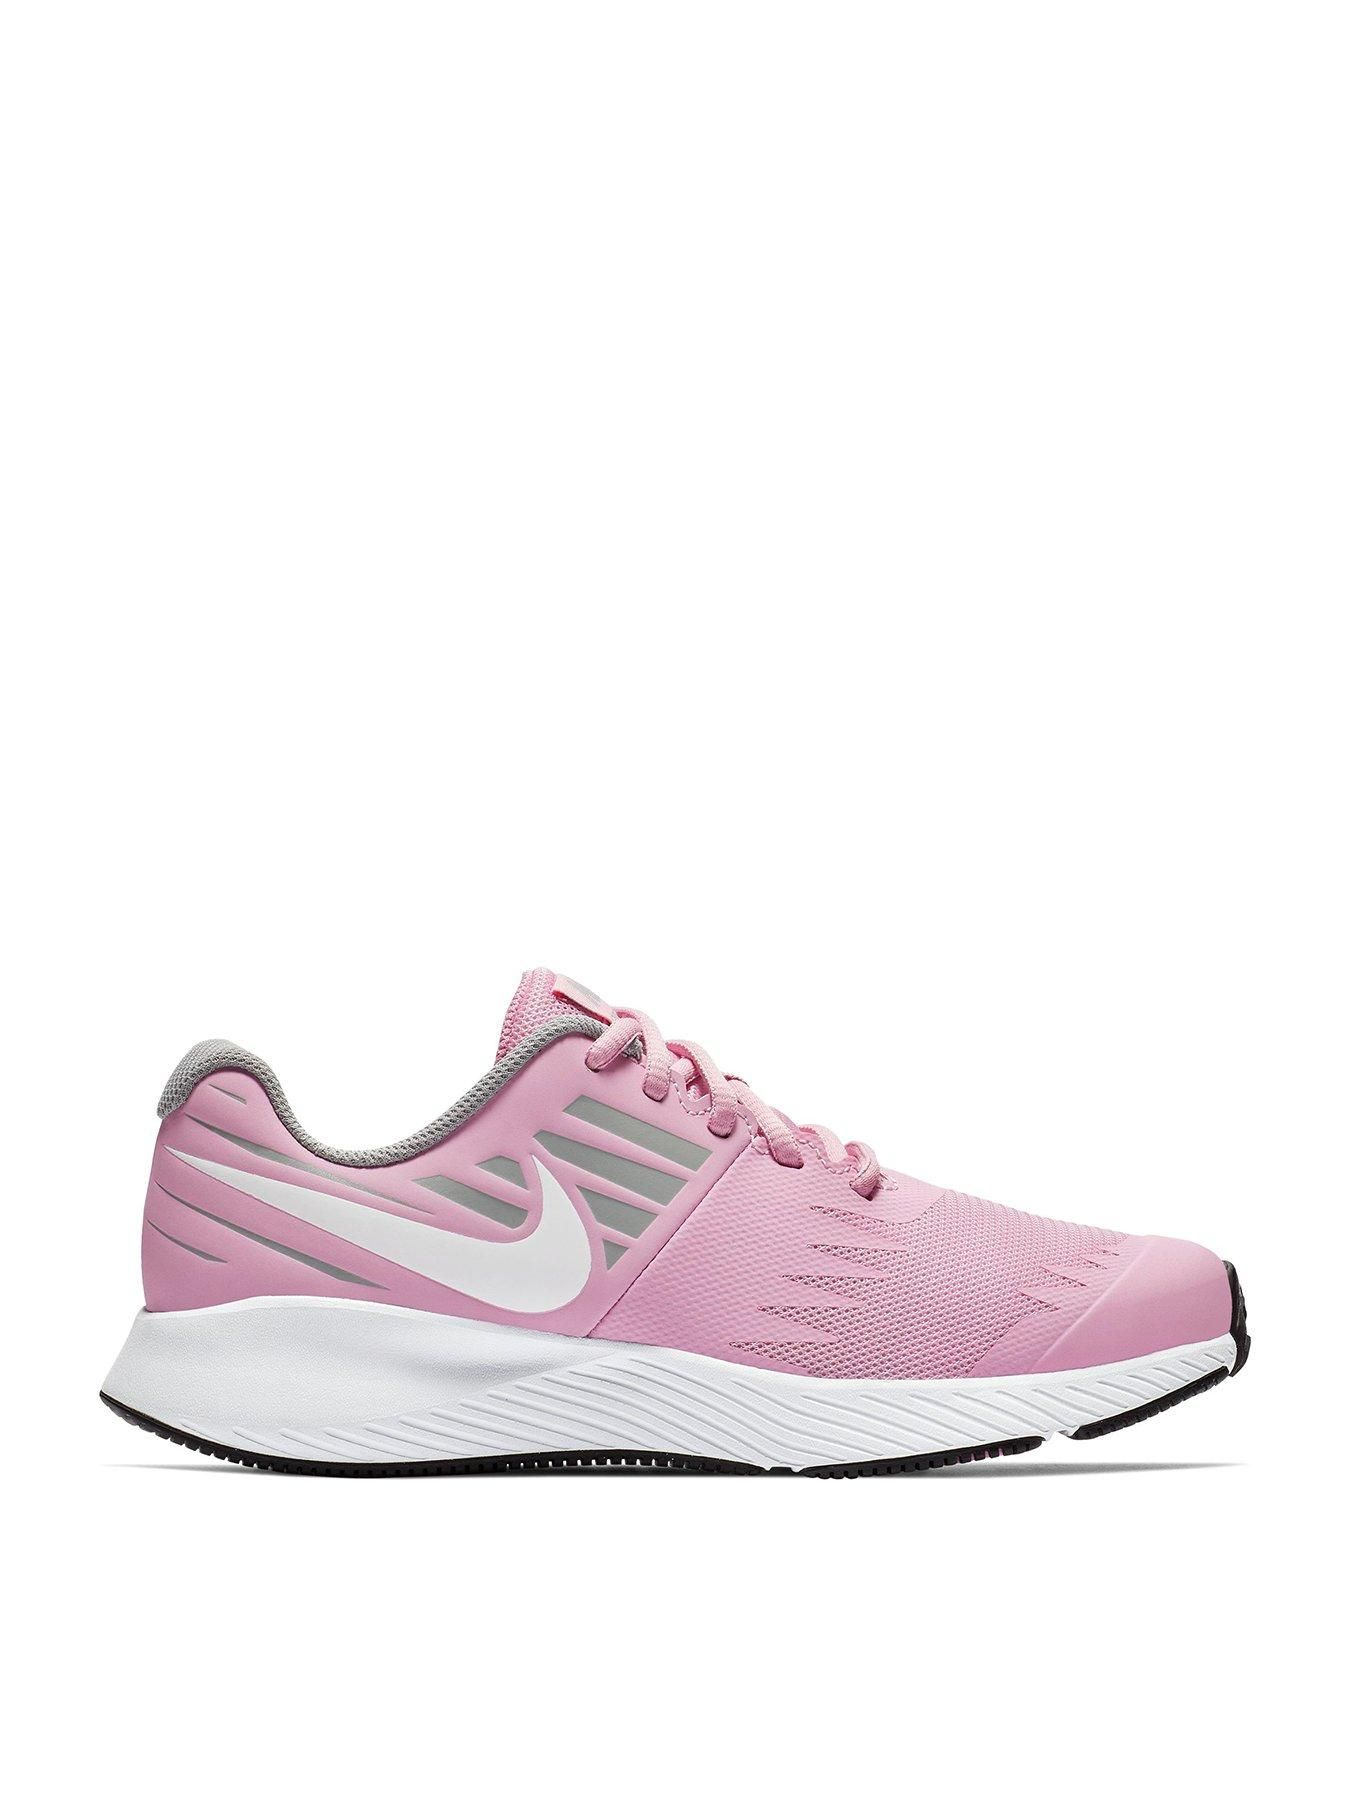 Nike Star Runner Junior Trainers - Pink